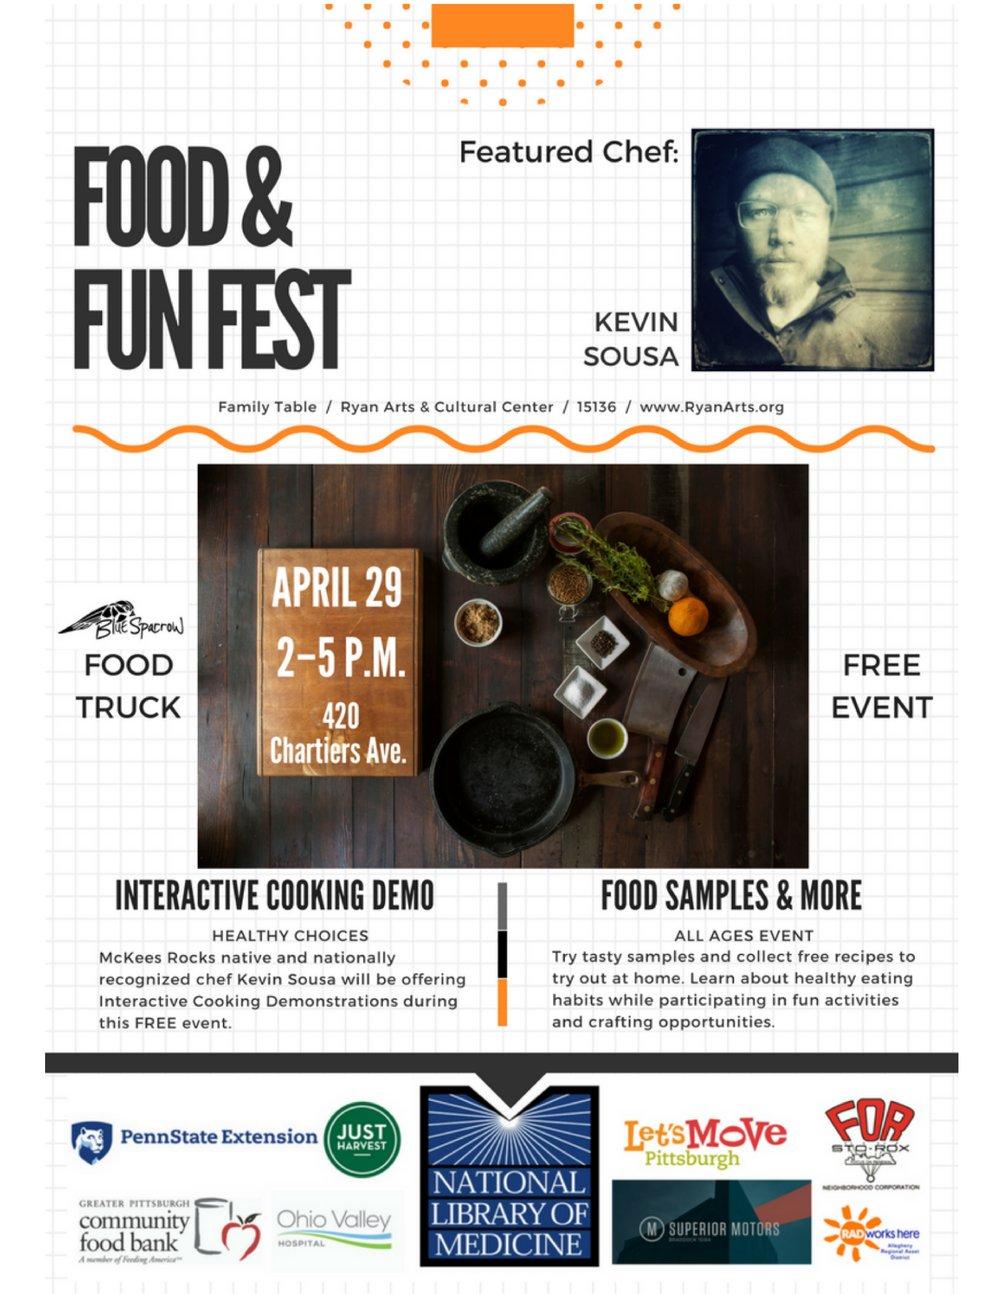 Food&FunFest+Souza+Picture.jpg